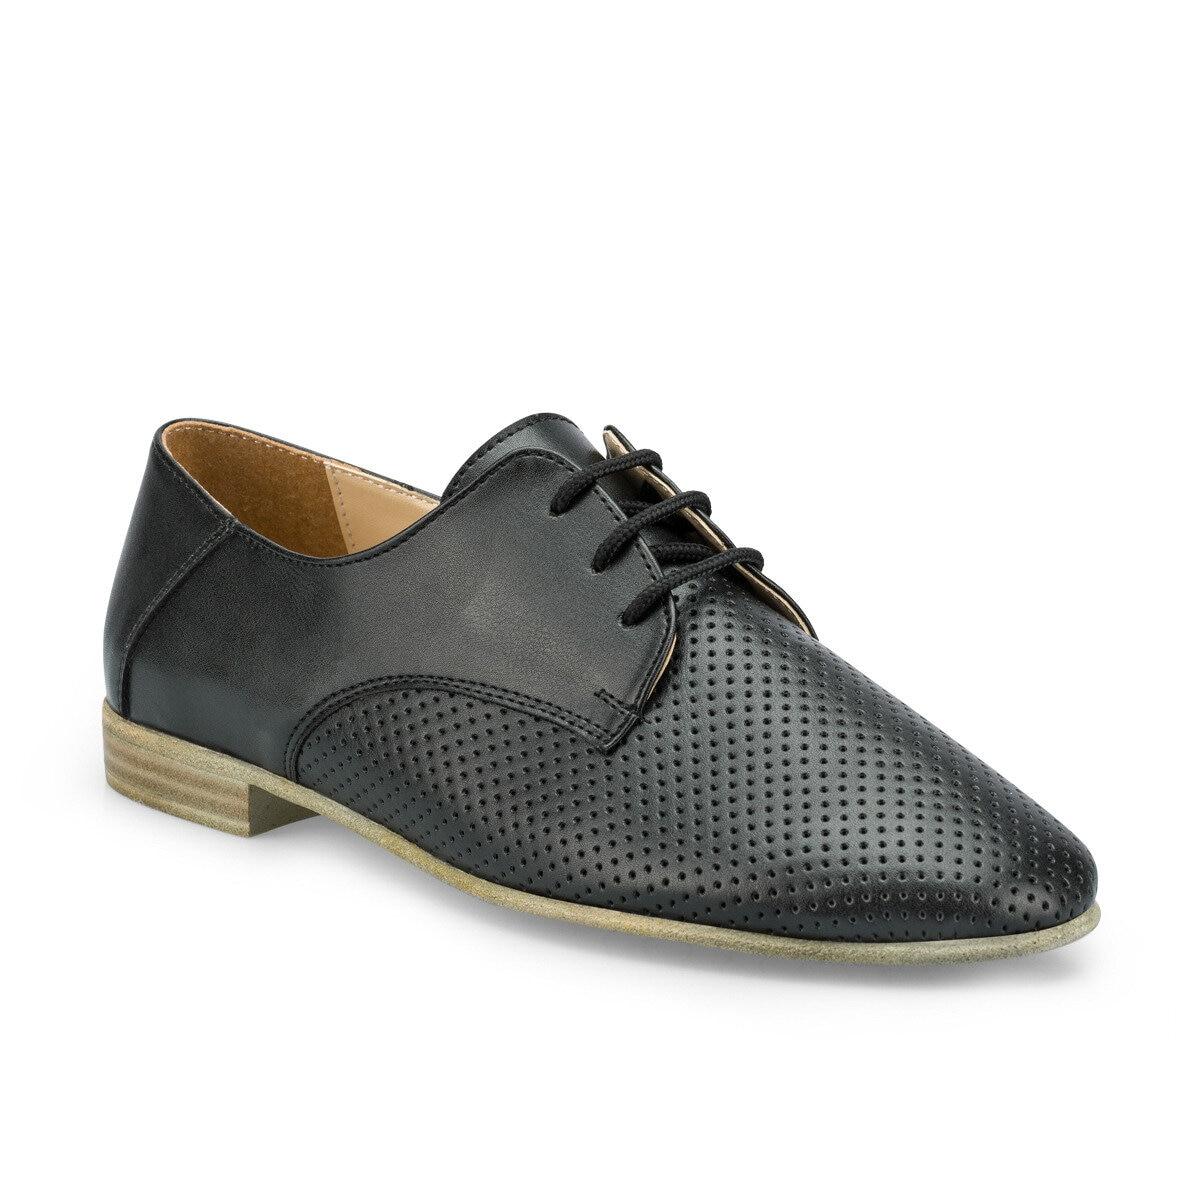 FLO 315098.Z Beige Women Oxford Shoes Polaris